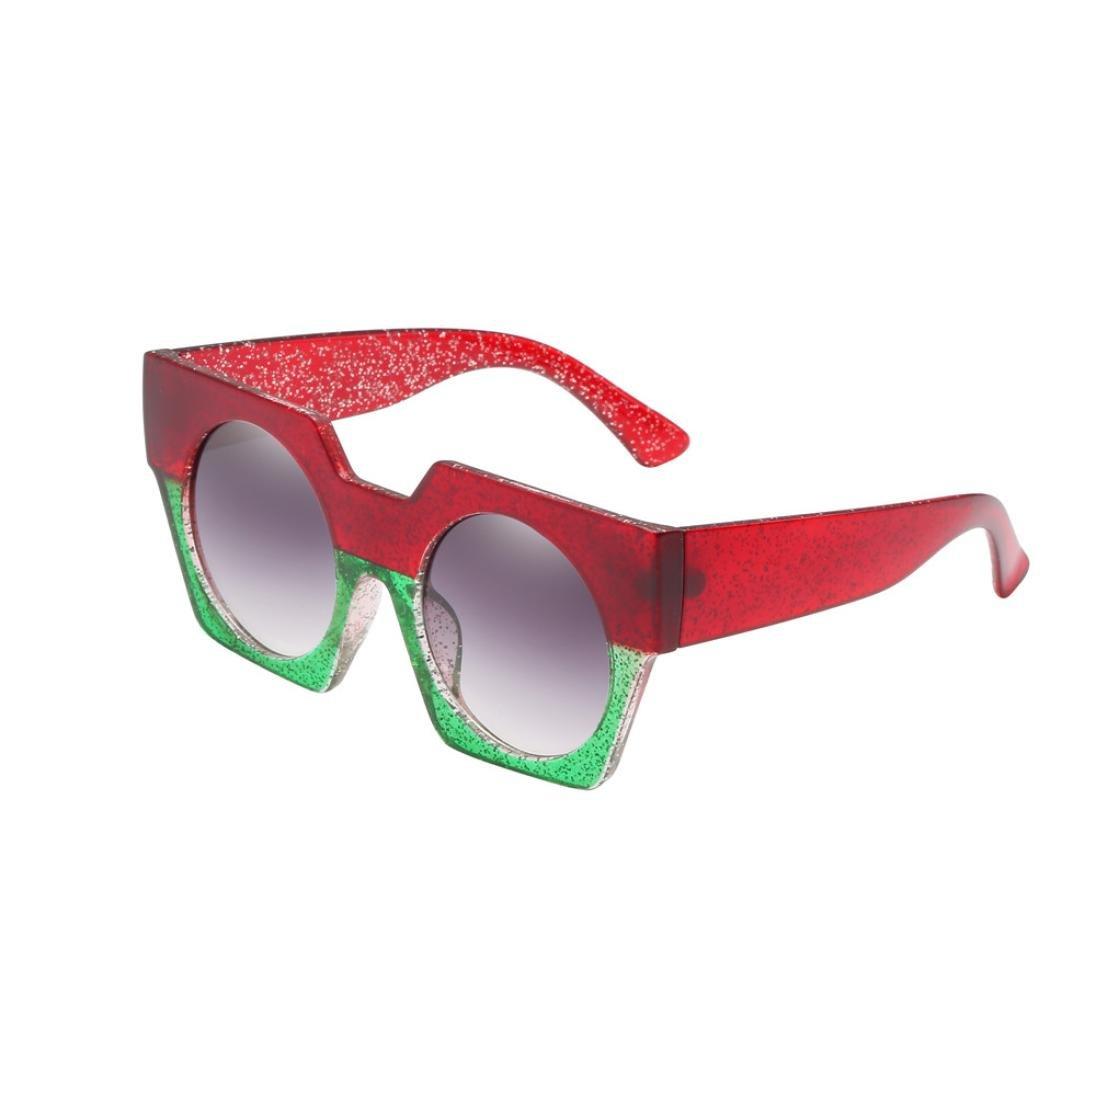 Amazon.com: Vertily Clout Gafas de sol retro de gran tamaño ...